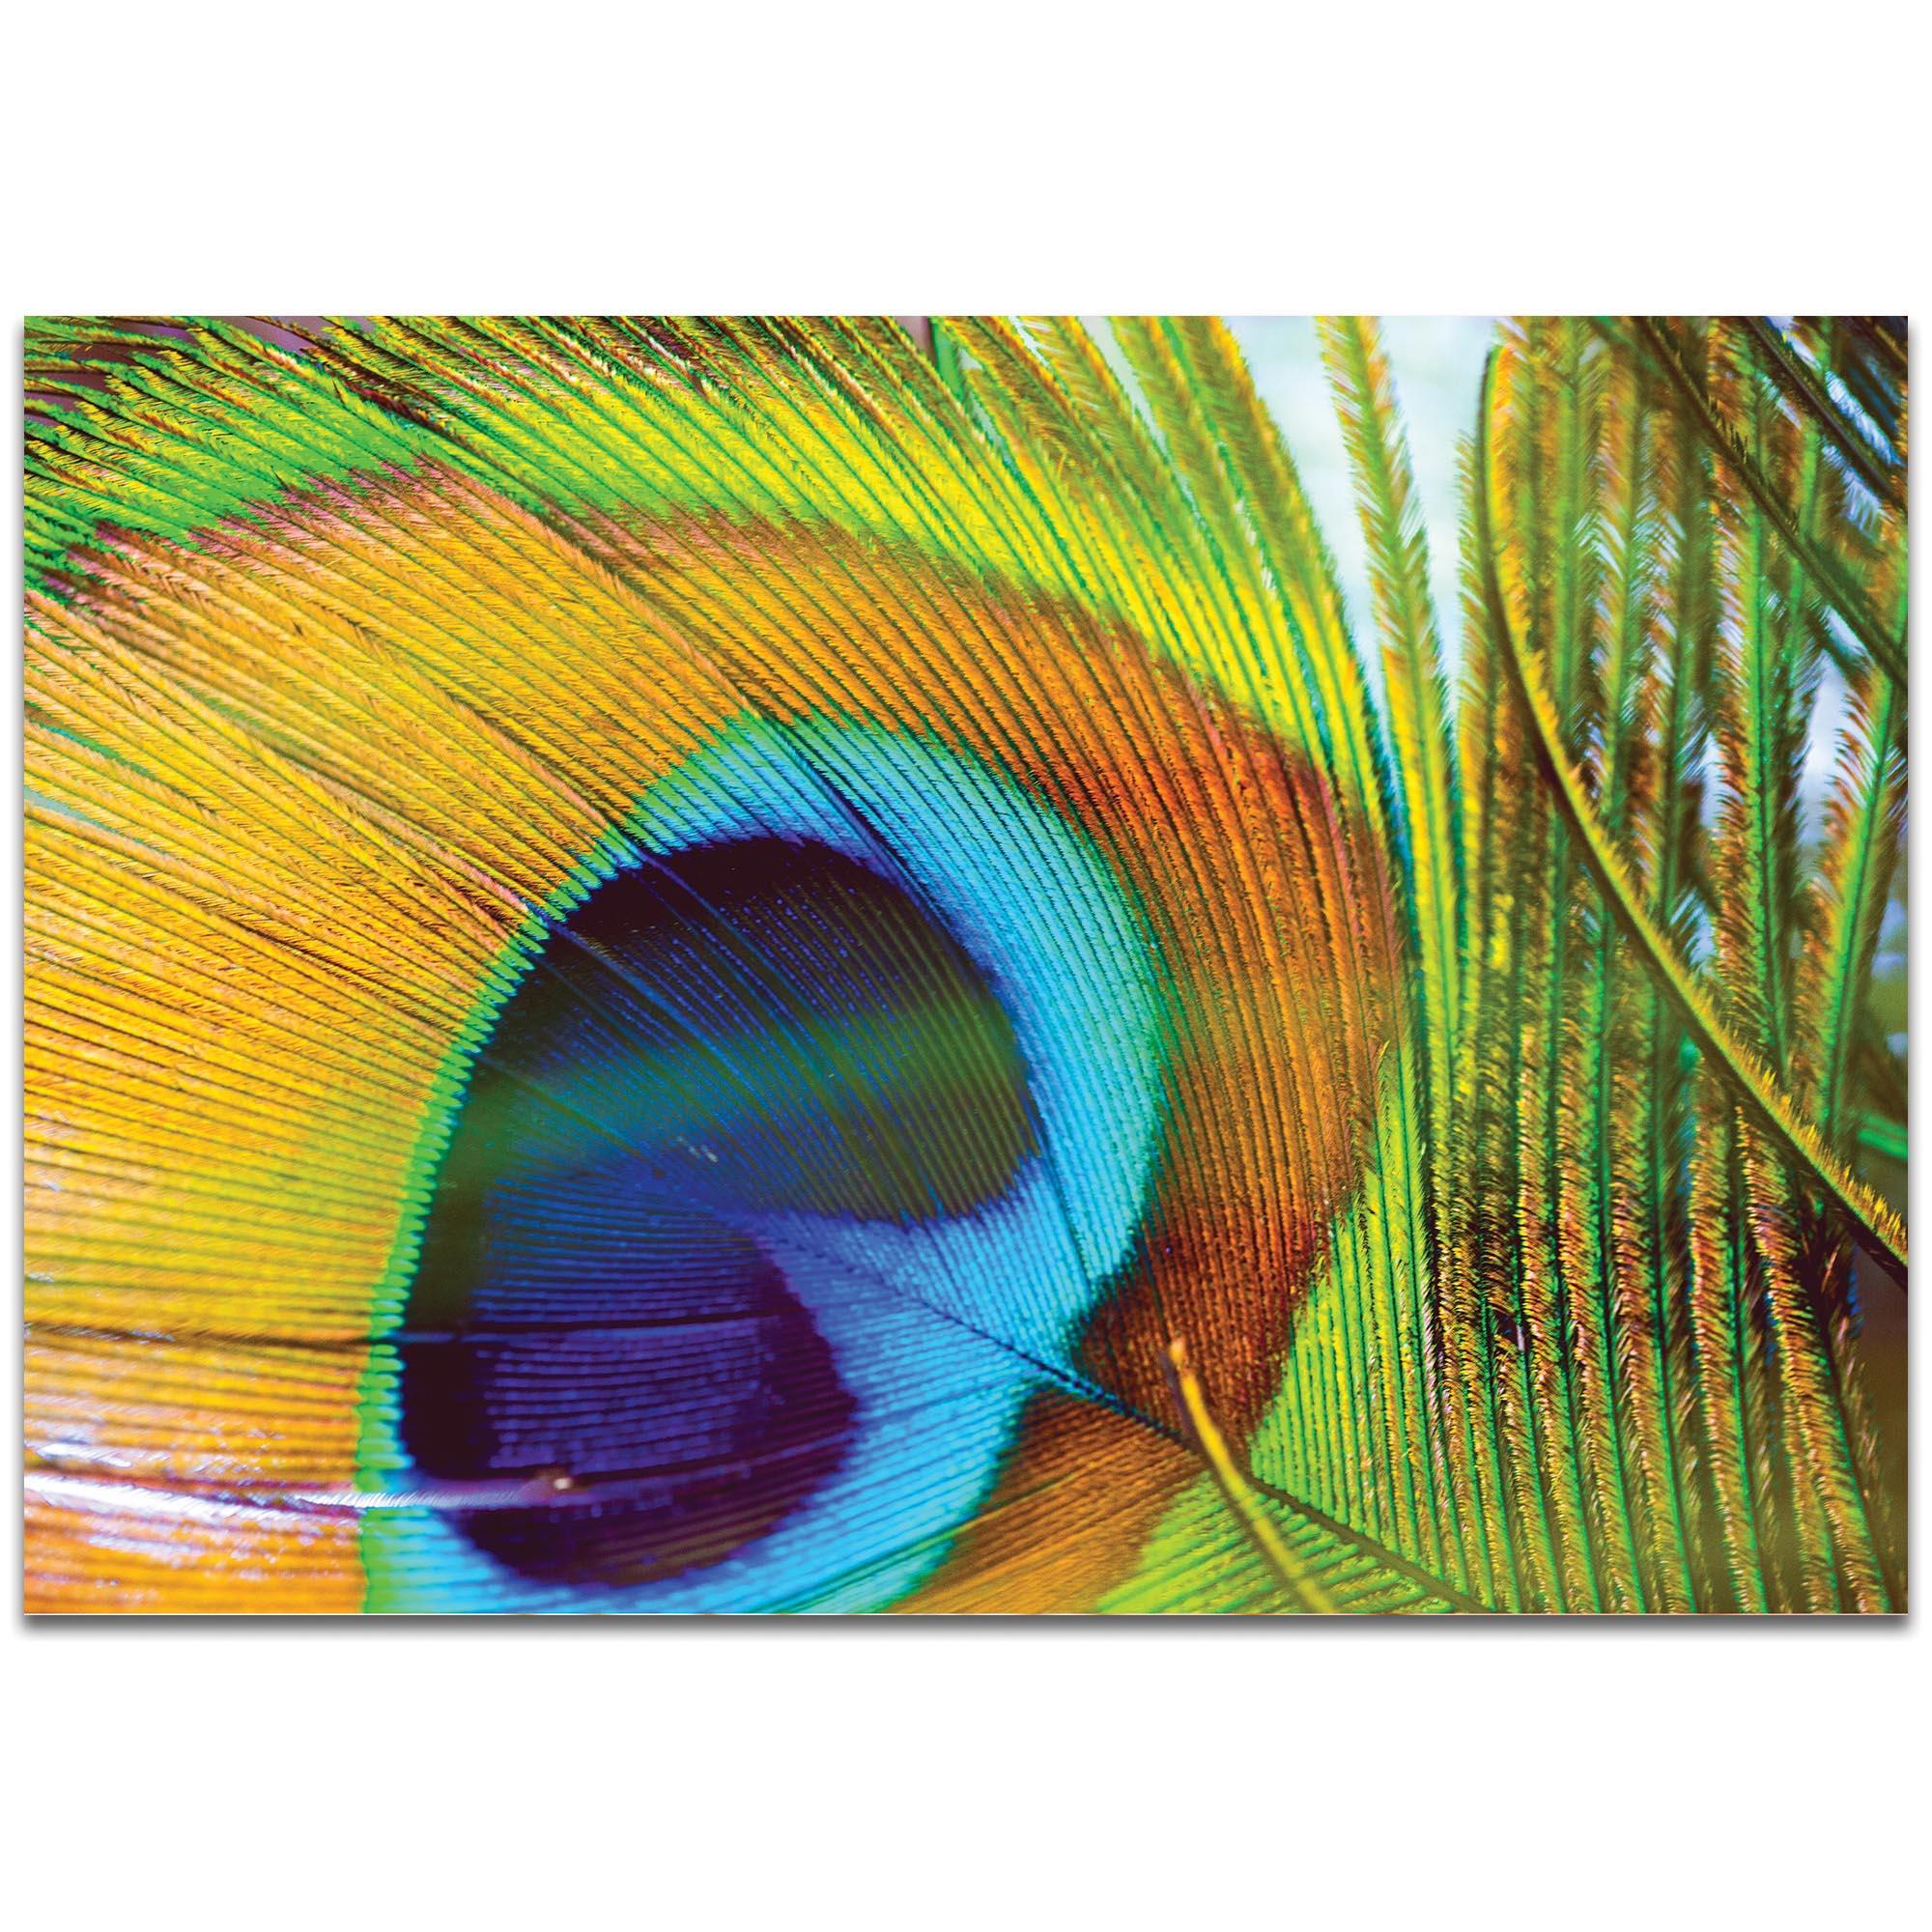 Contemporary Wall Art 'Peacock Colors' - Wildlife Decor on Metal or Plexiglass